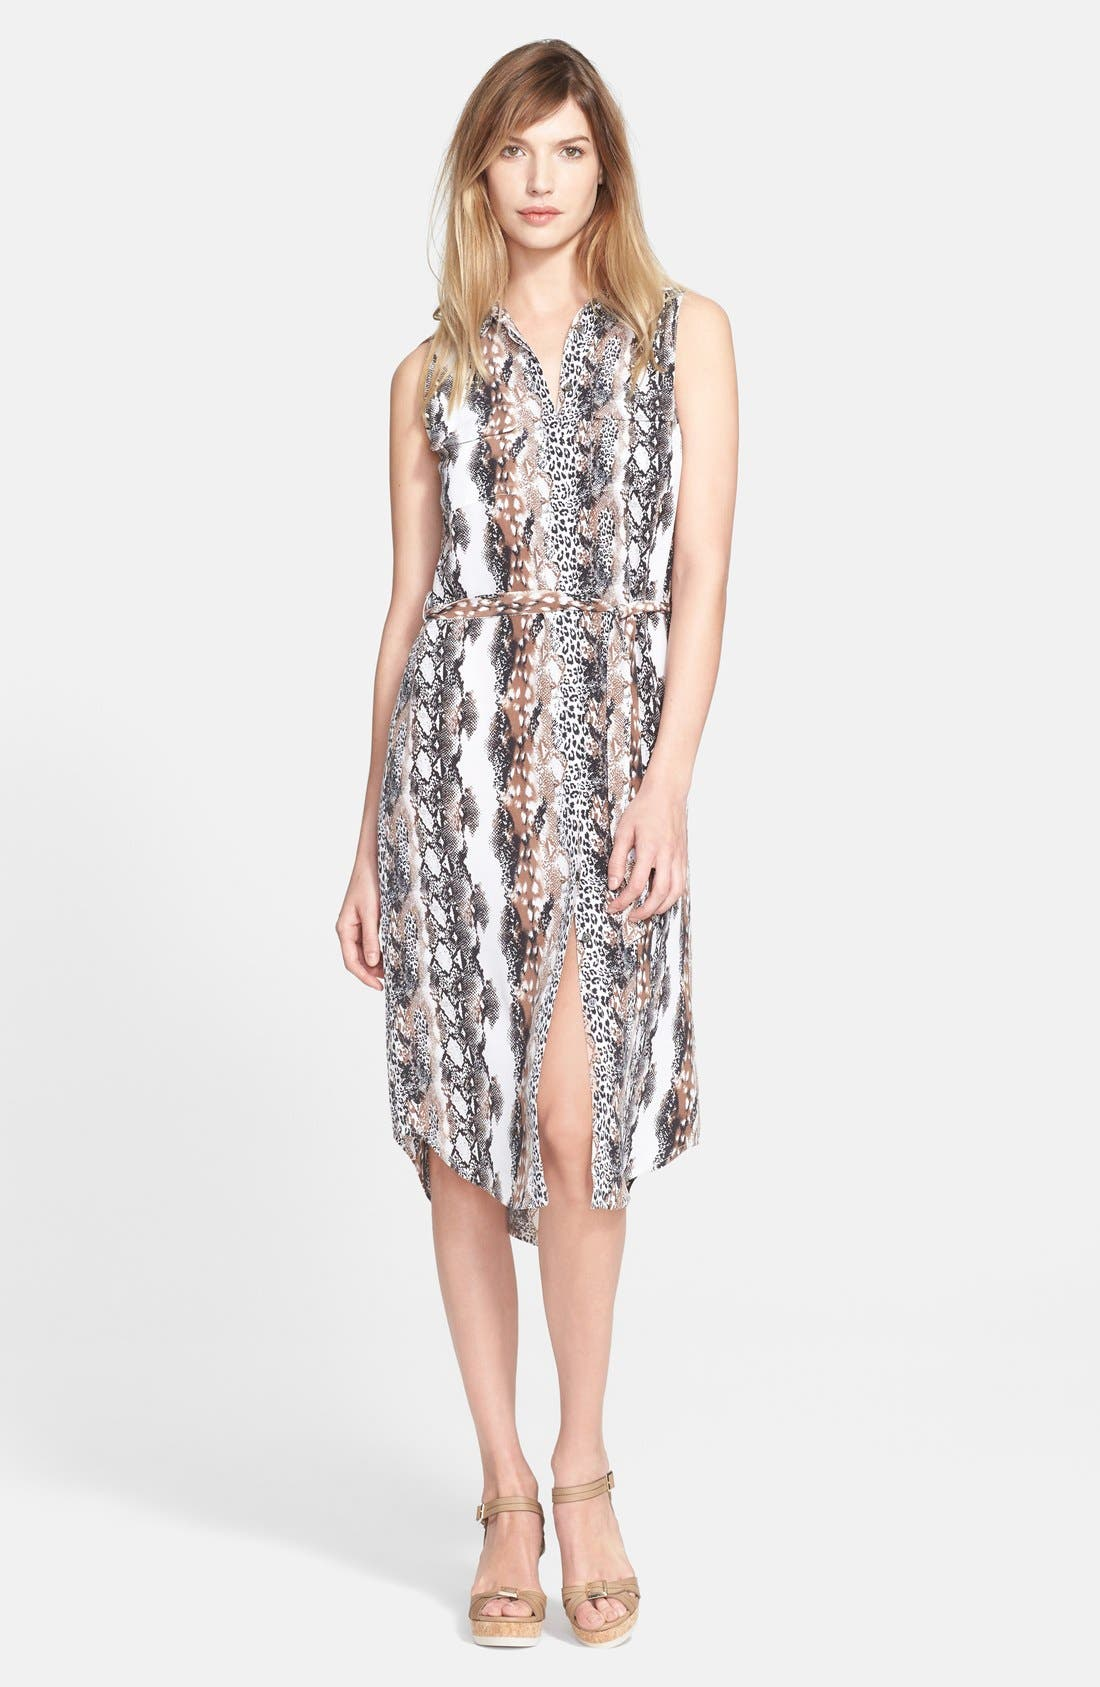 Alternate Image 1 Selected - Equipment 'Teagan' Print Silk Dress